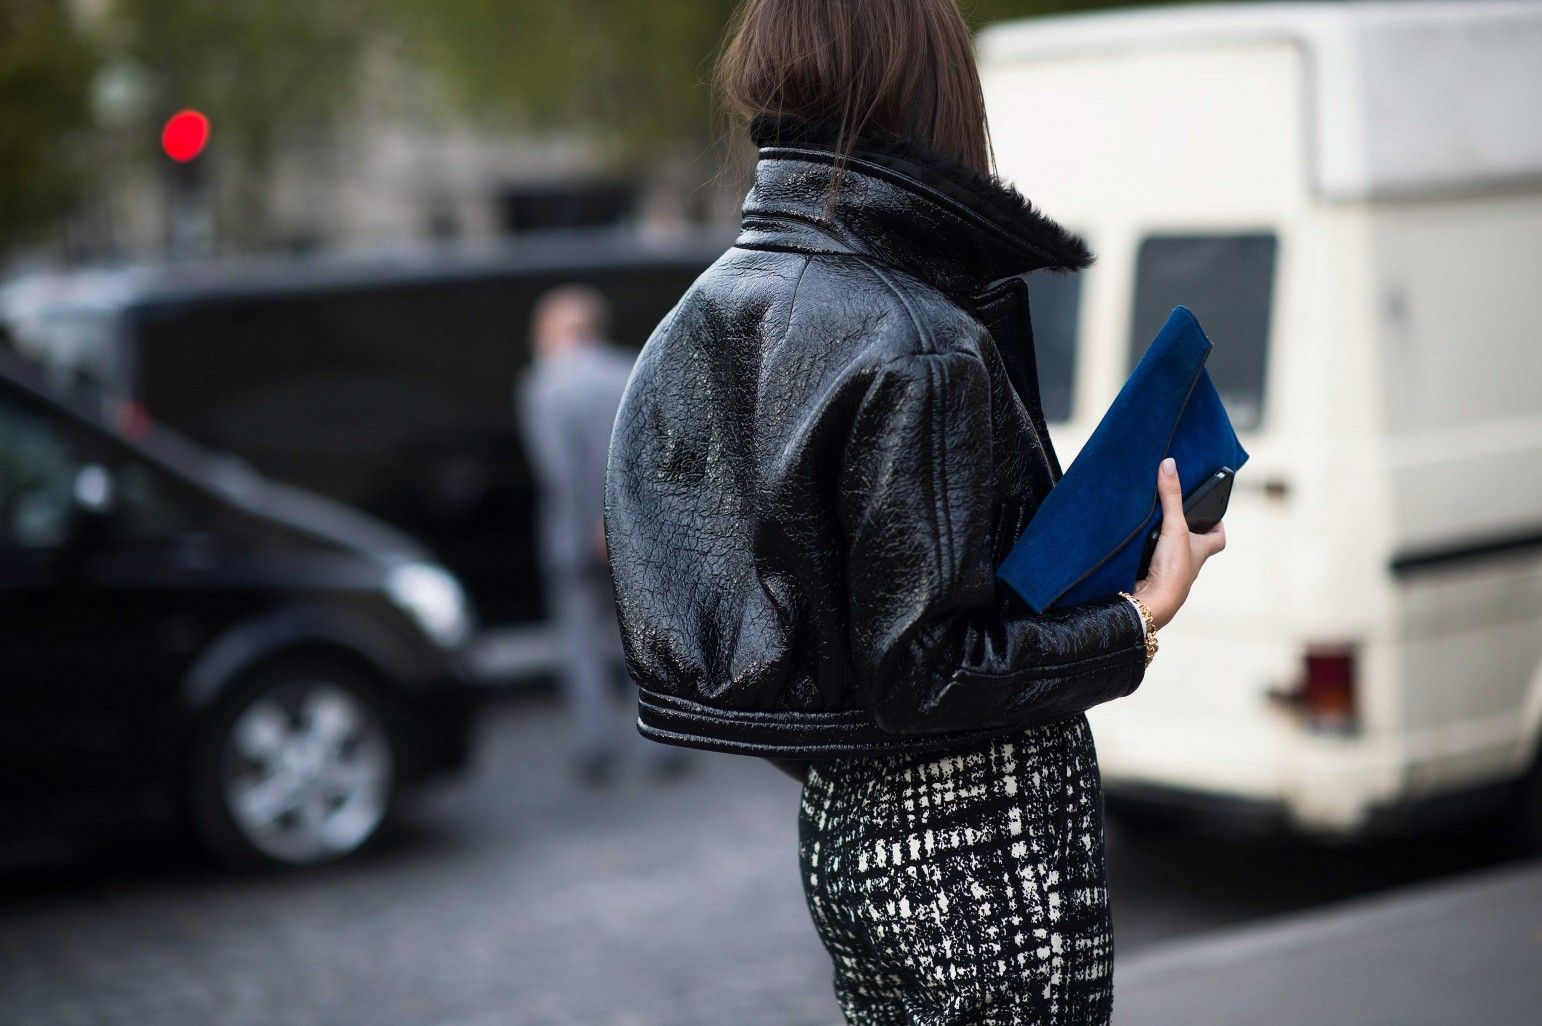 Street Style from Paris Fashion Week Spring 2014 - Paris Fashion Week Spring 2014 Street Style, Day 1